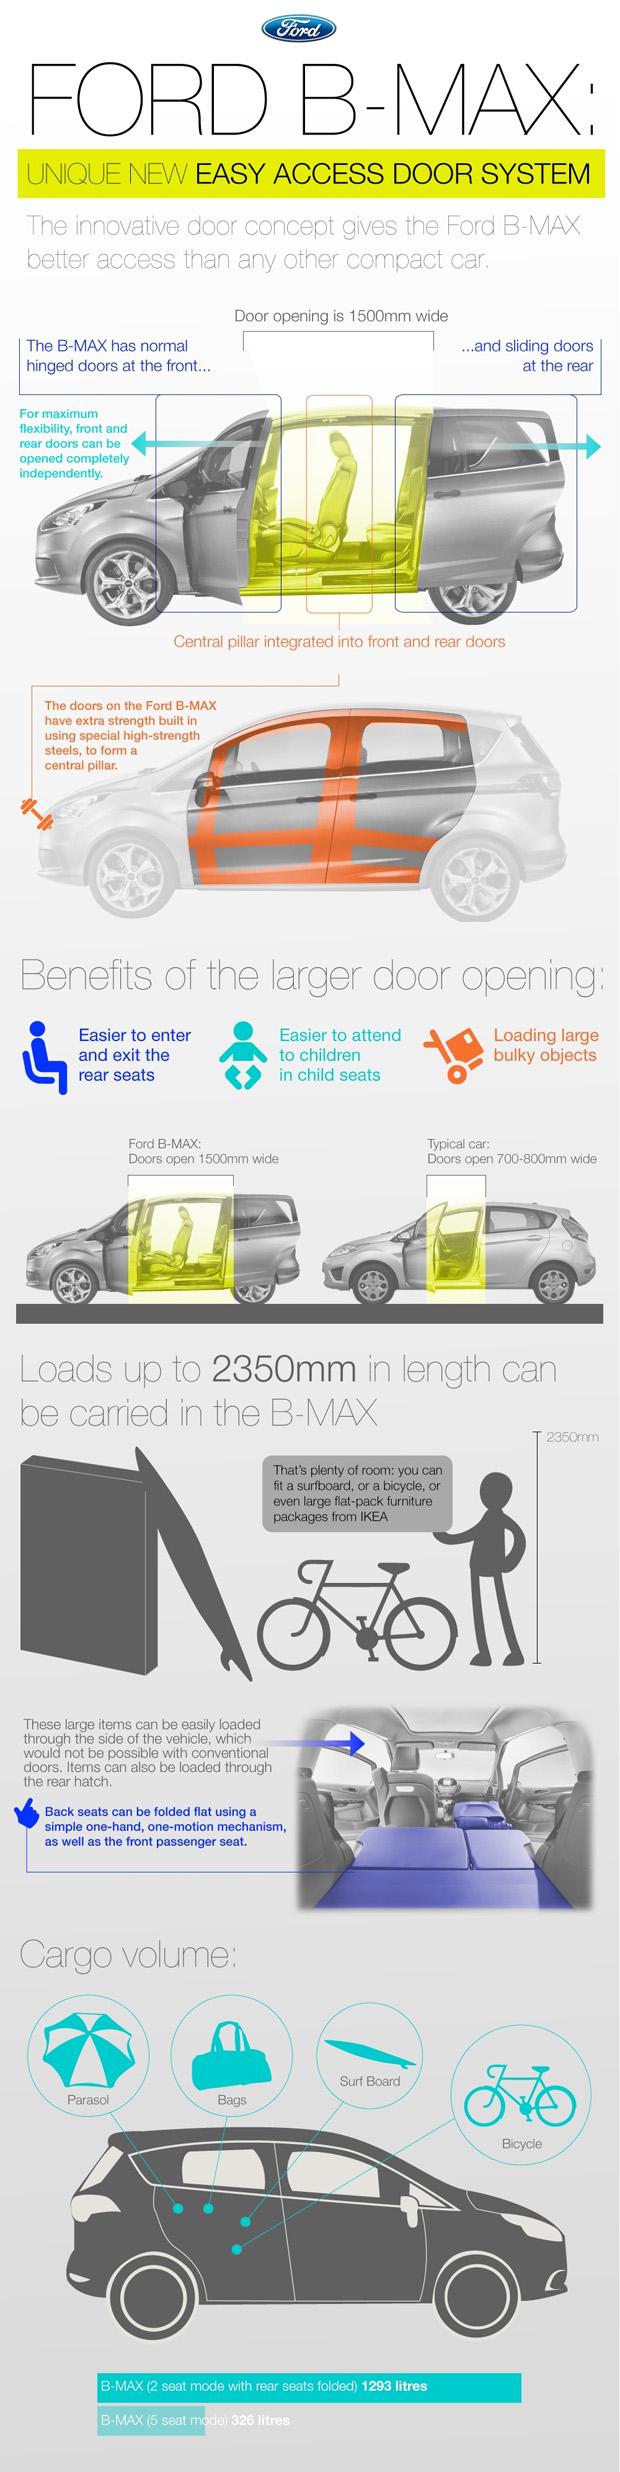 Ford B-Max Easy Access door